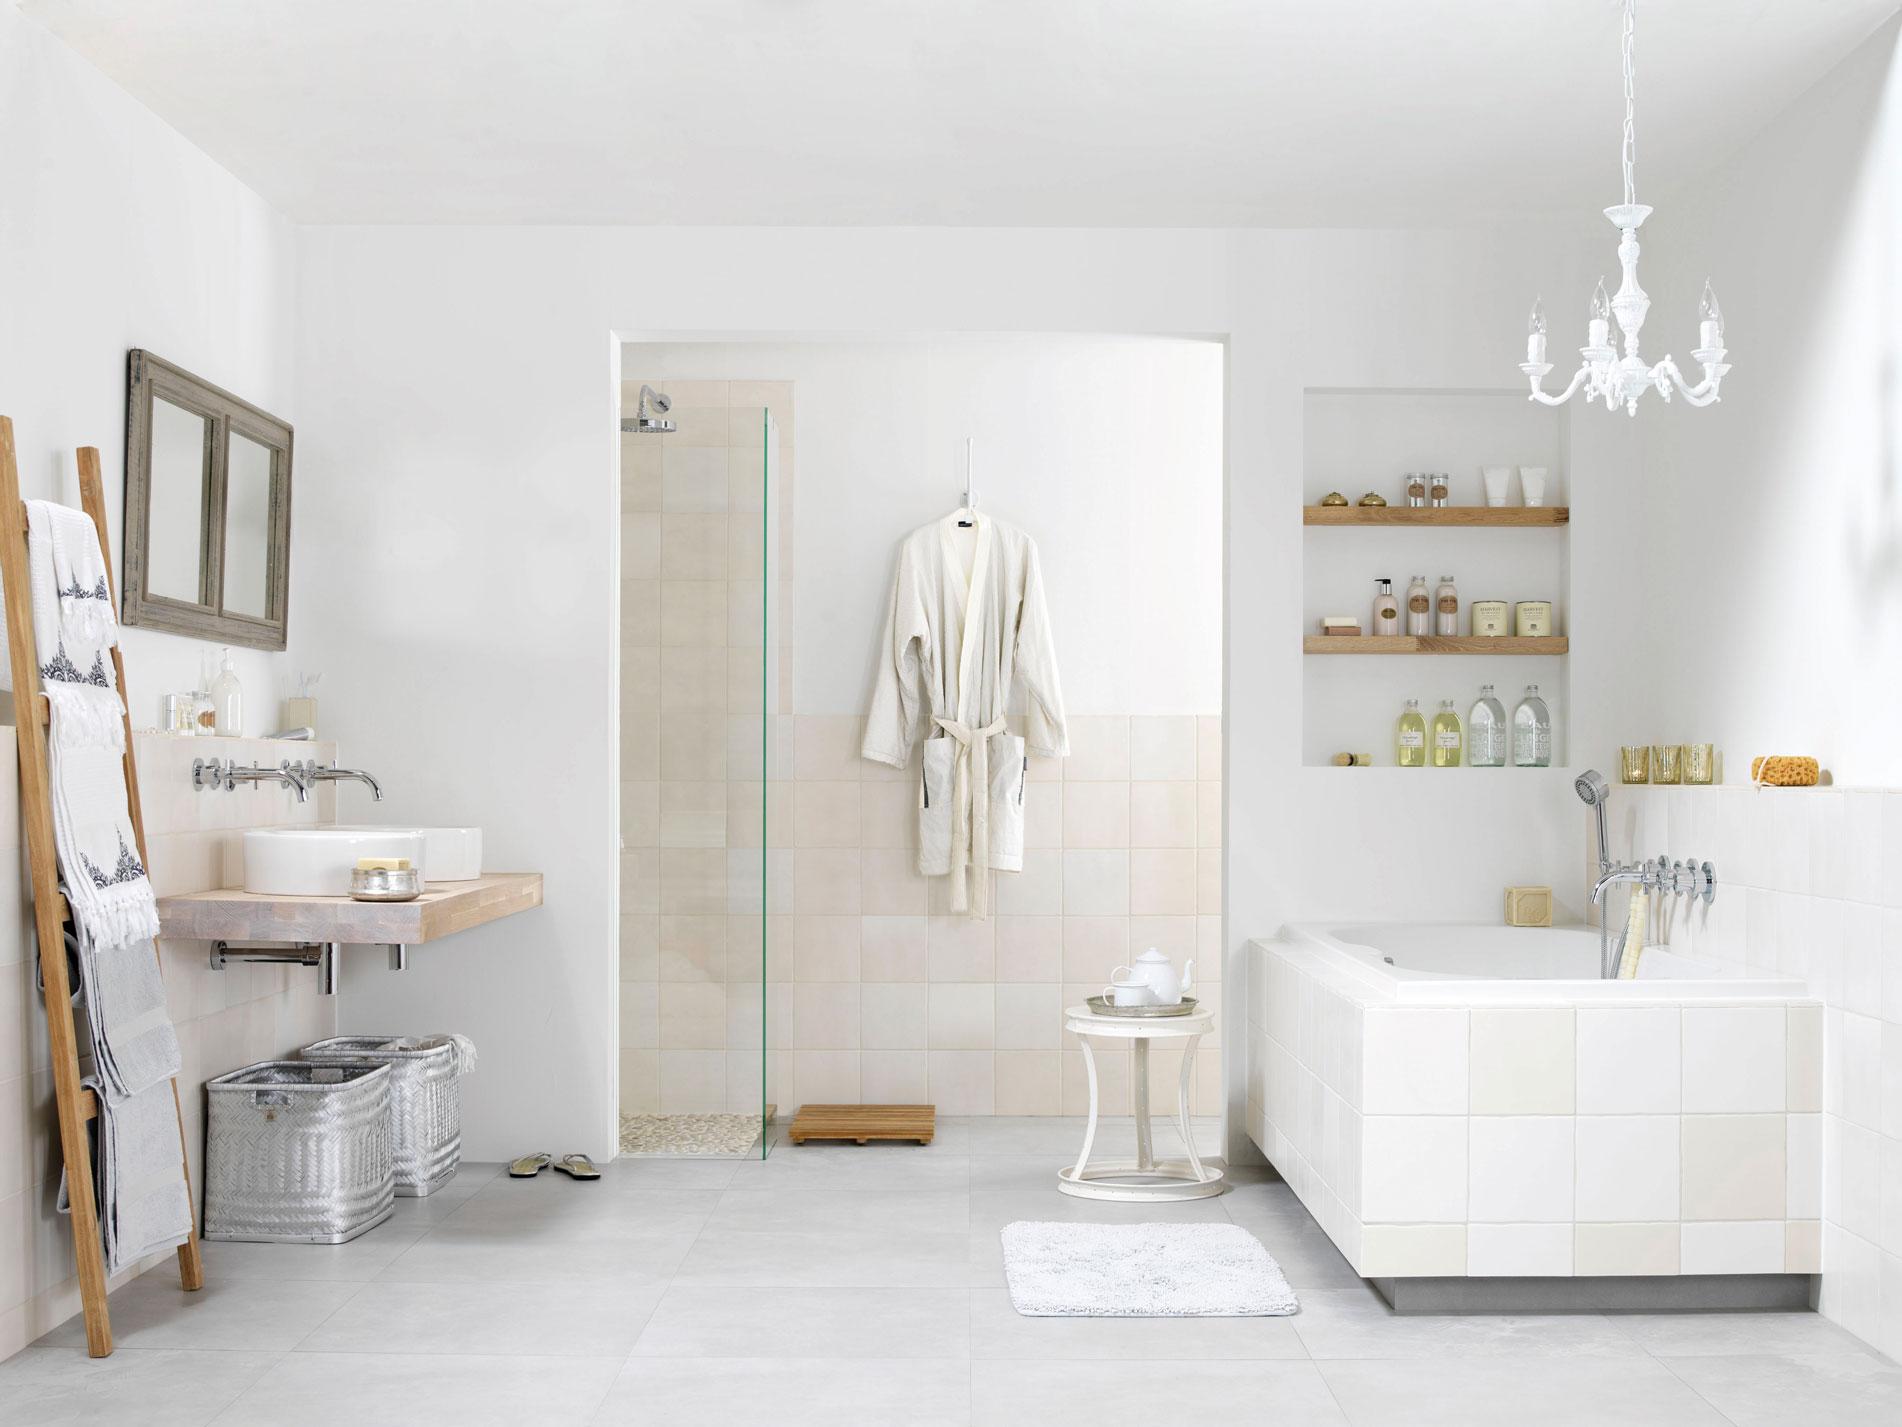 stappenplan nieuwe badkamer tg wonen woonmagazine